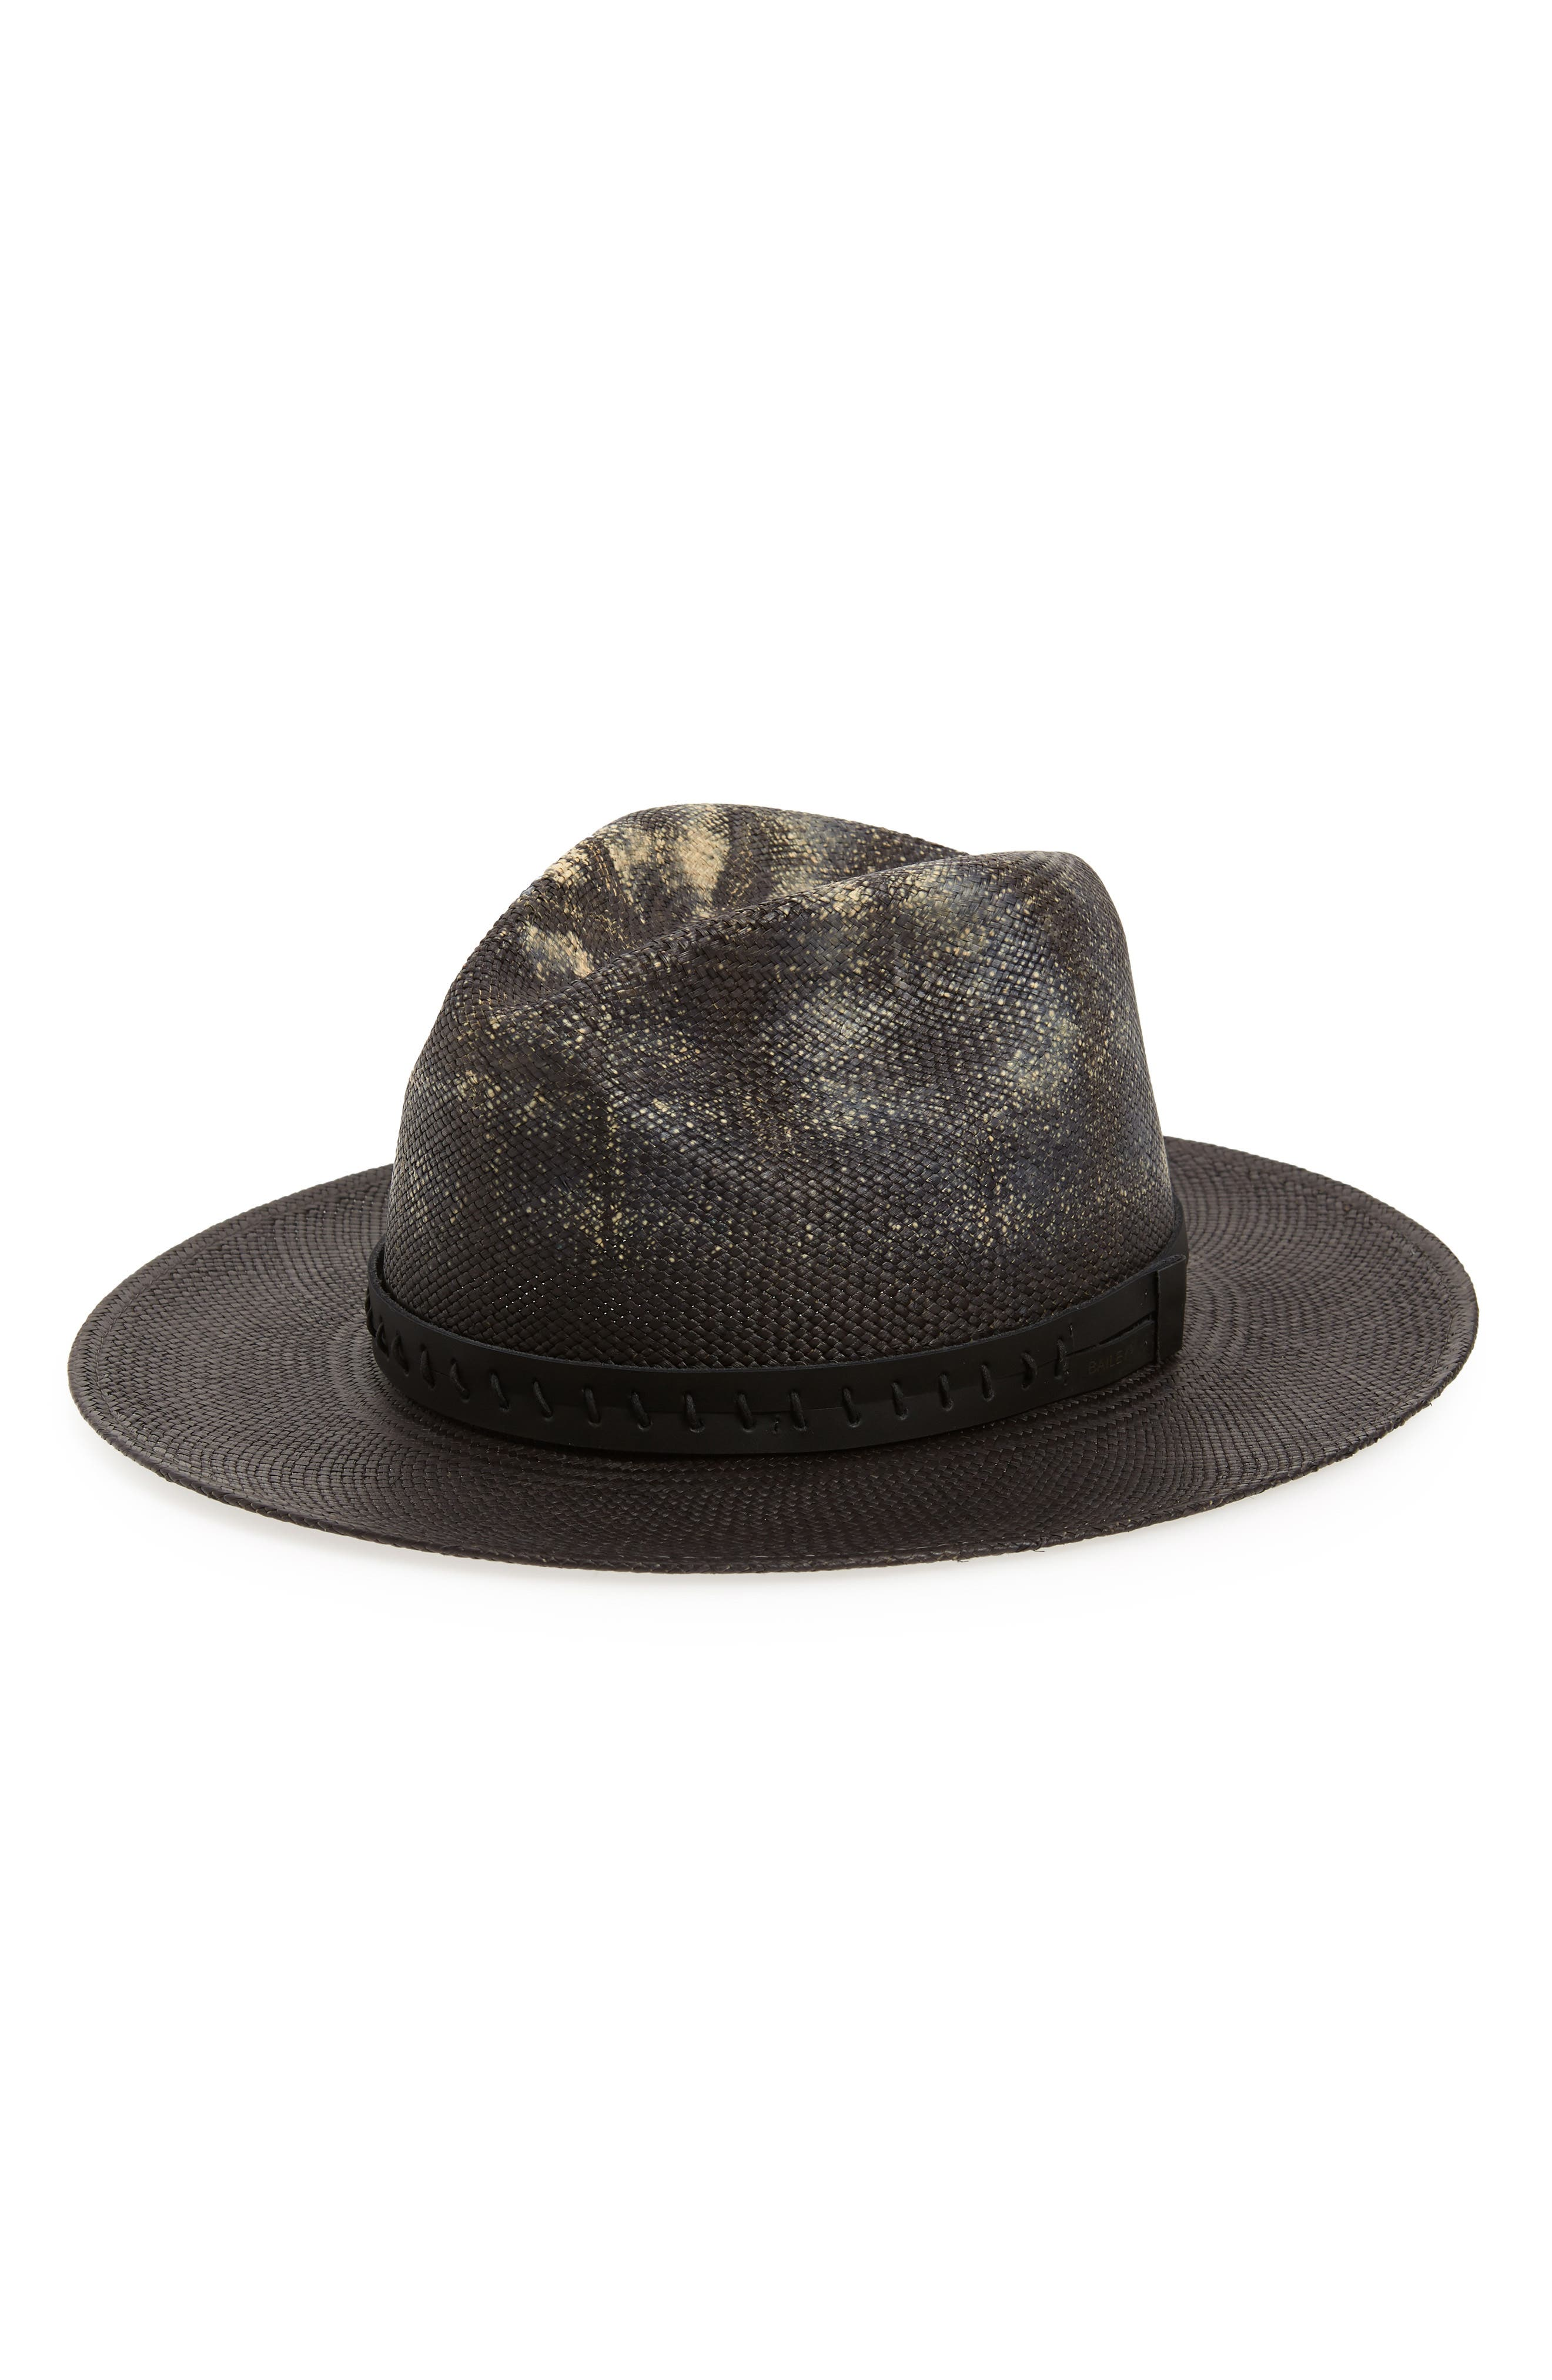 Dune Straw Panama Hat,                             Main thumbnail 1, color,                             Distressed Black